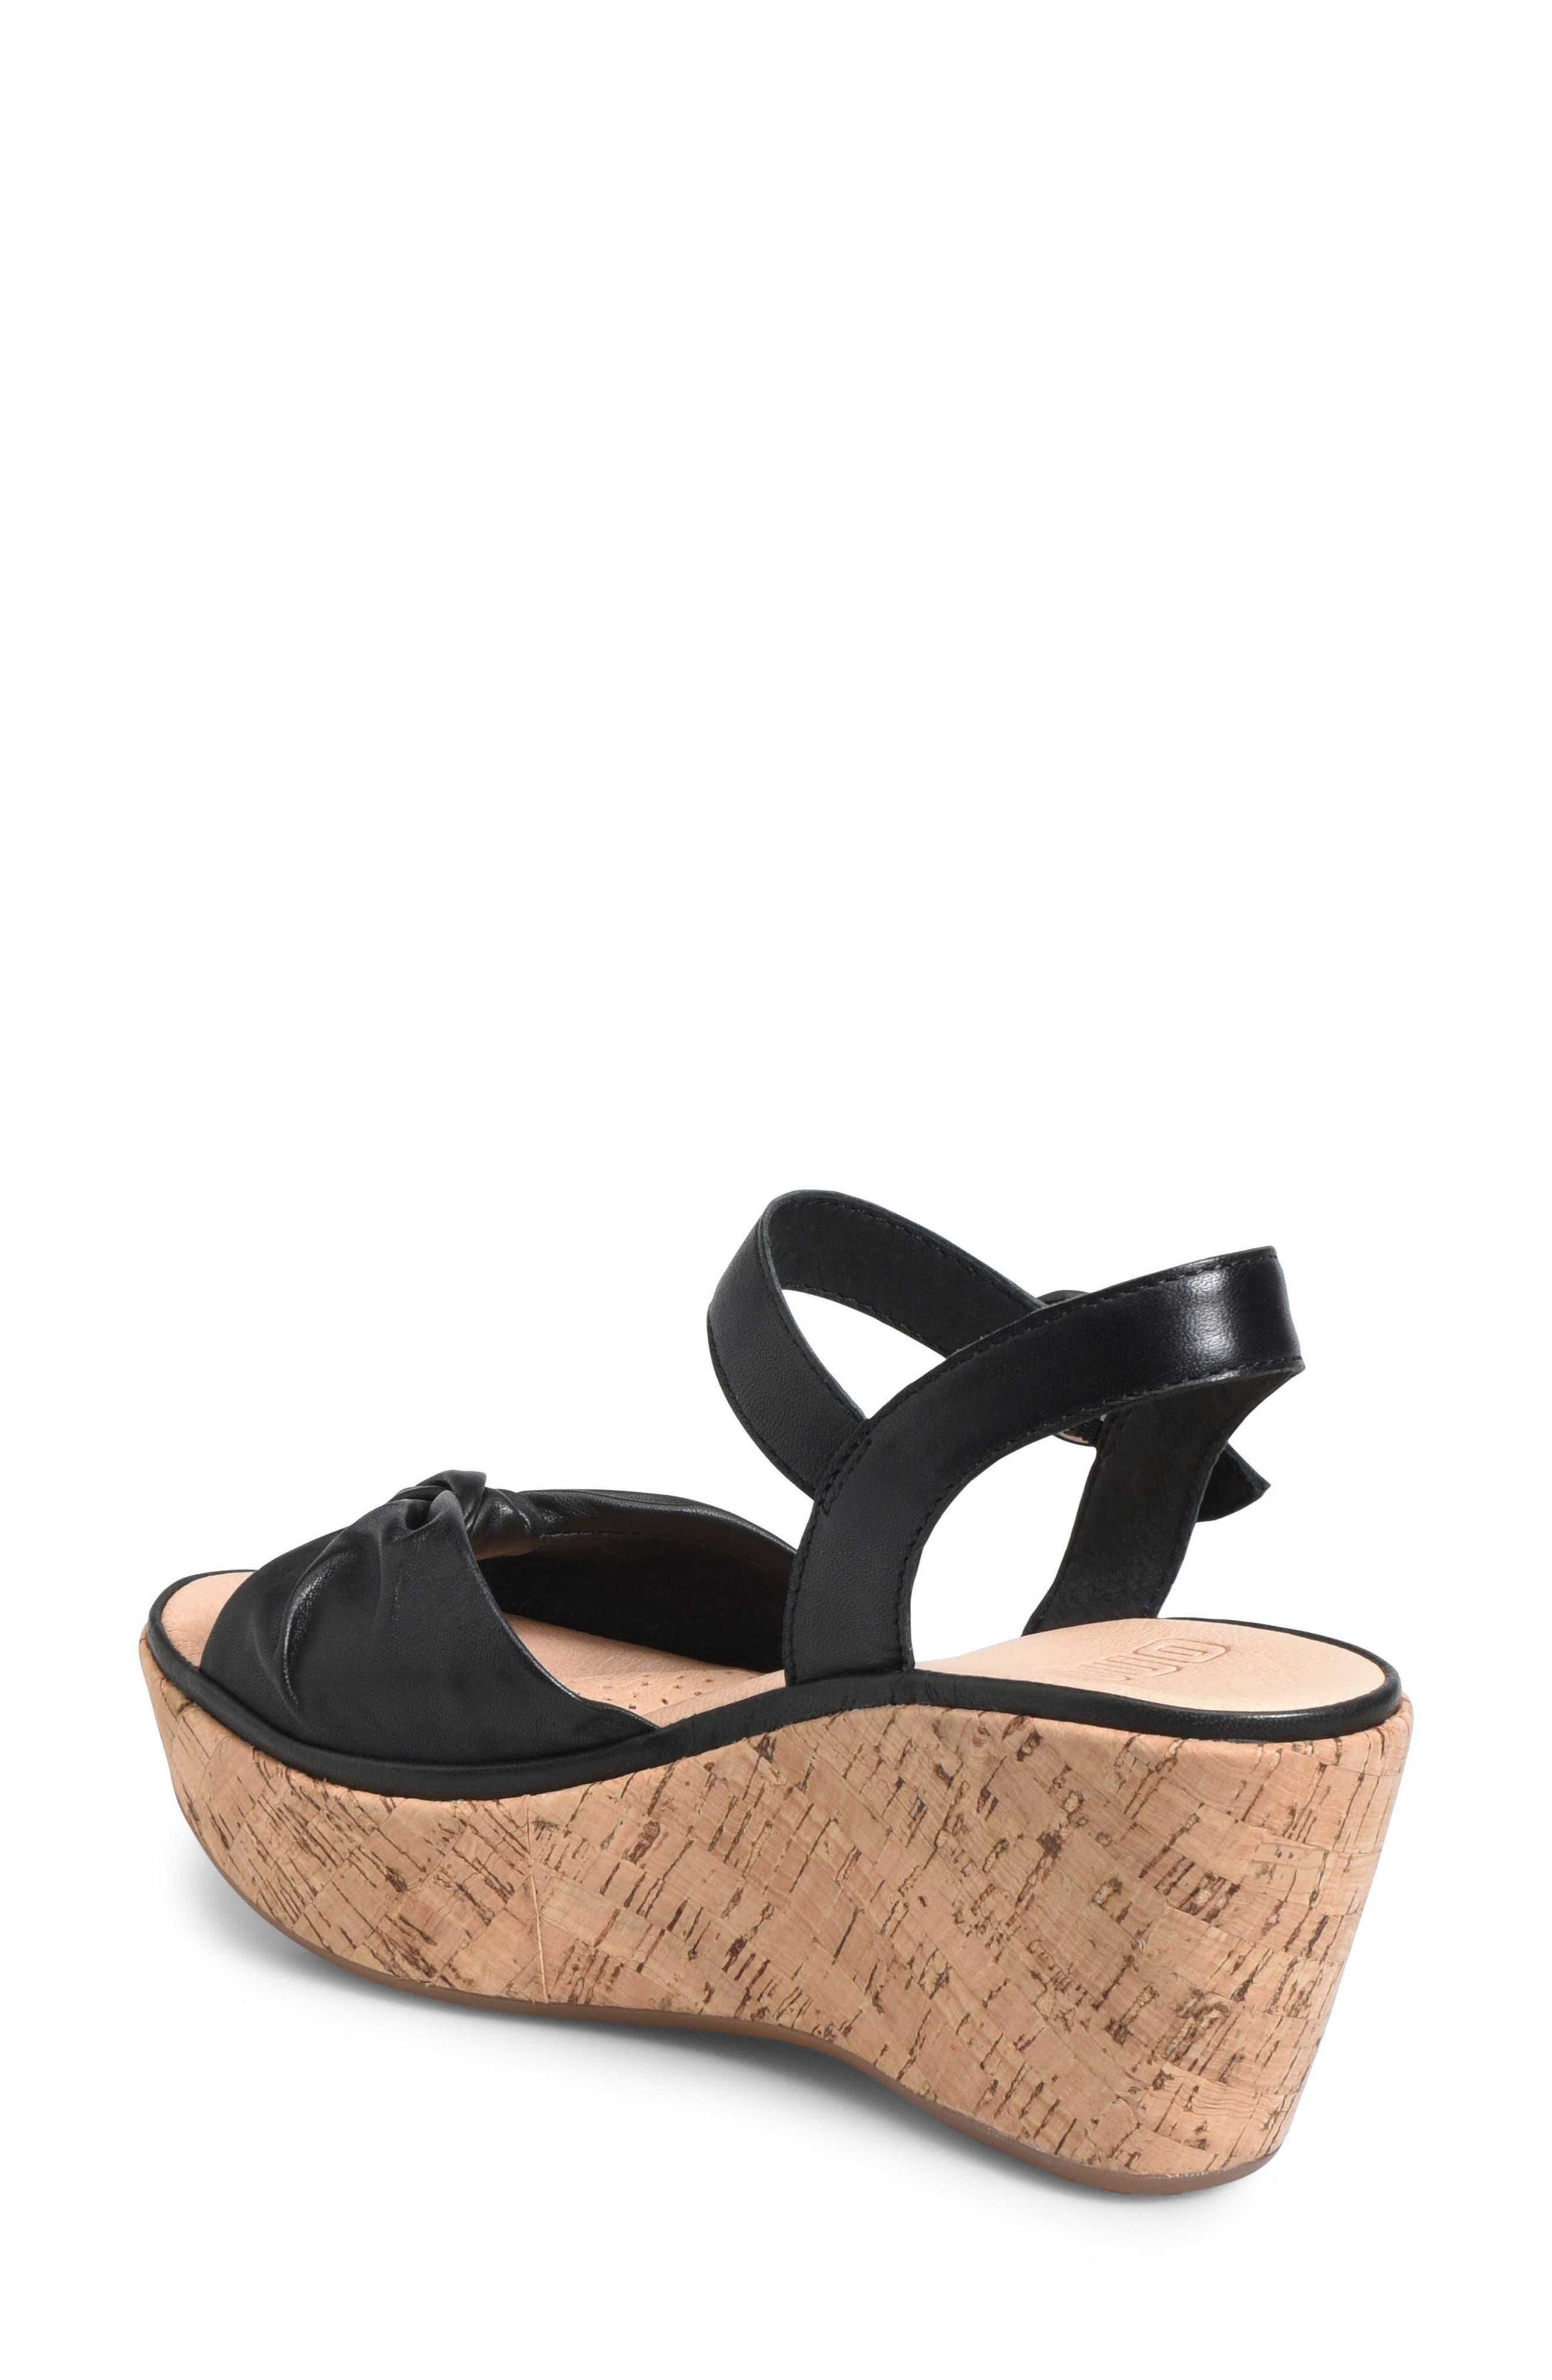 ONO, Heavenly Platform Wedge Sandal, Alternate thumbnail 2, color, BLACK LEATHER